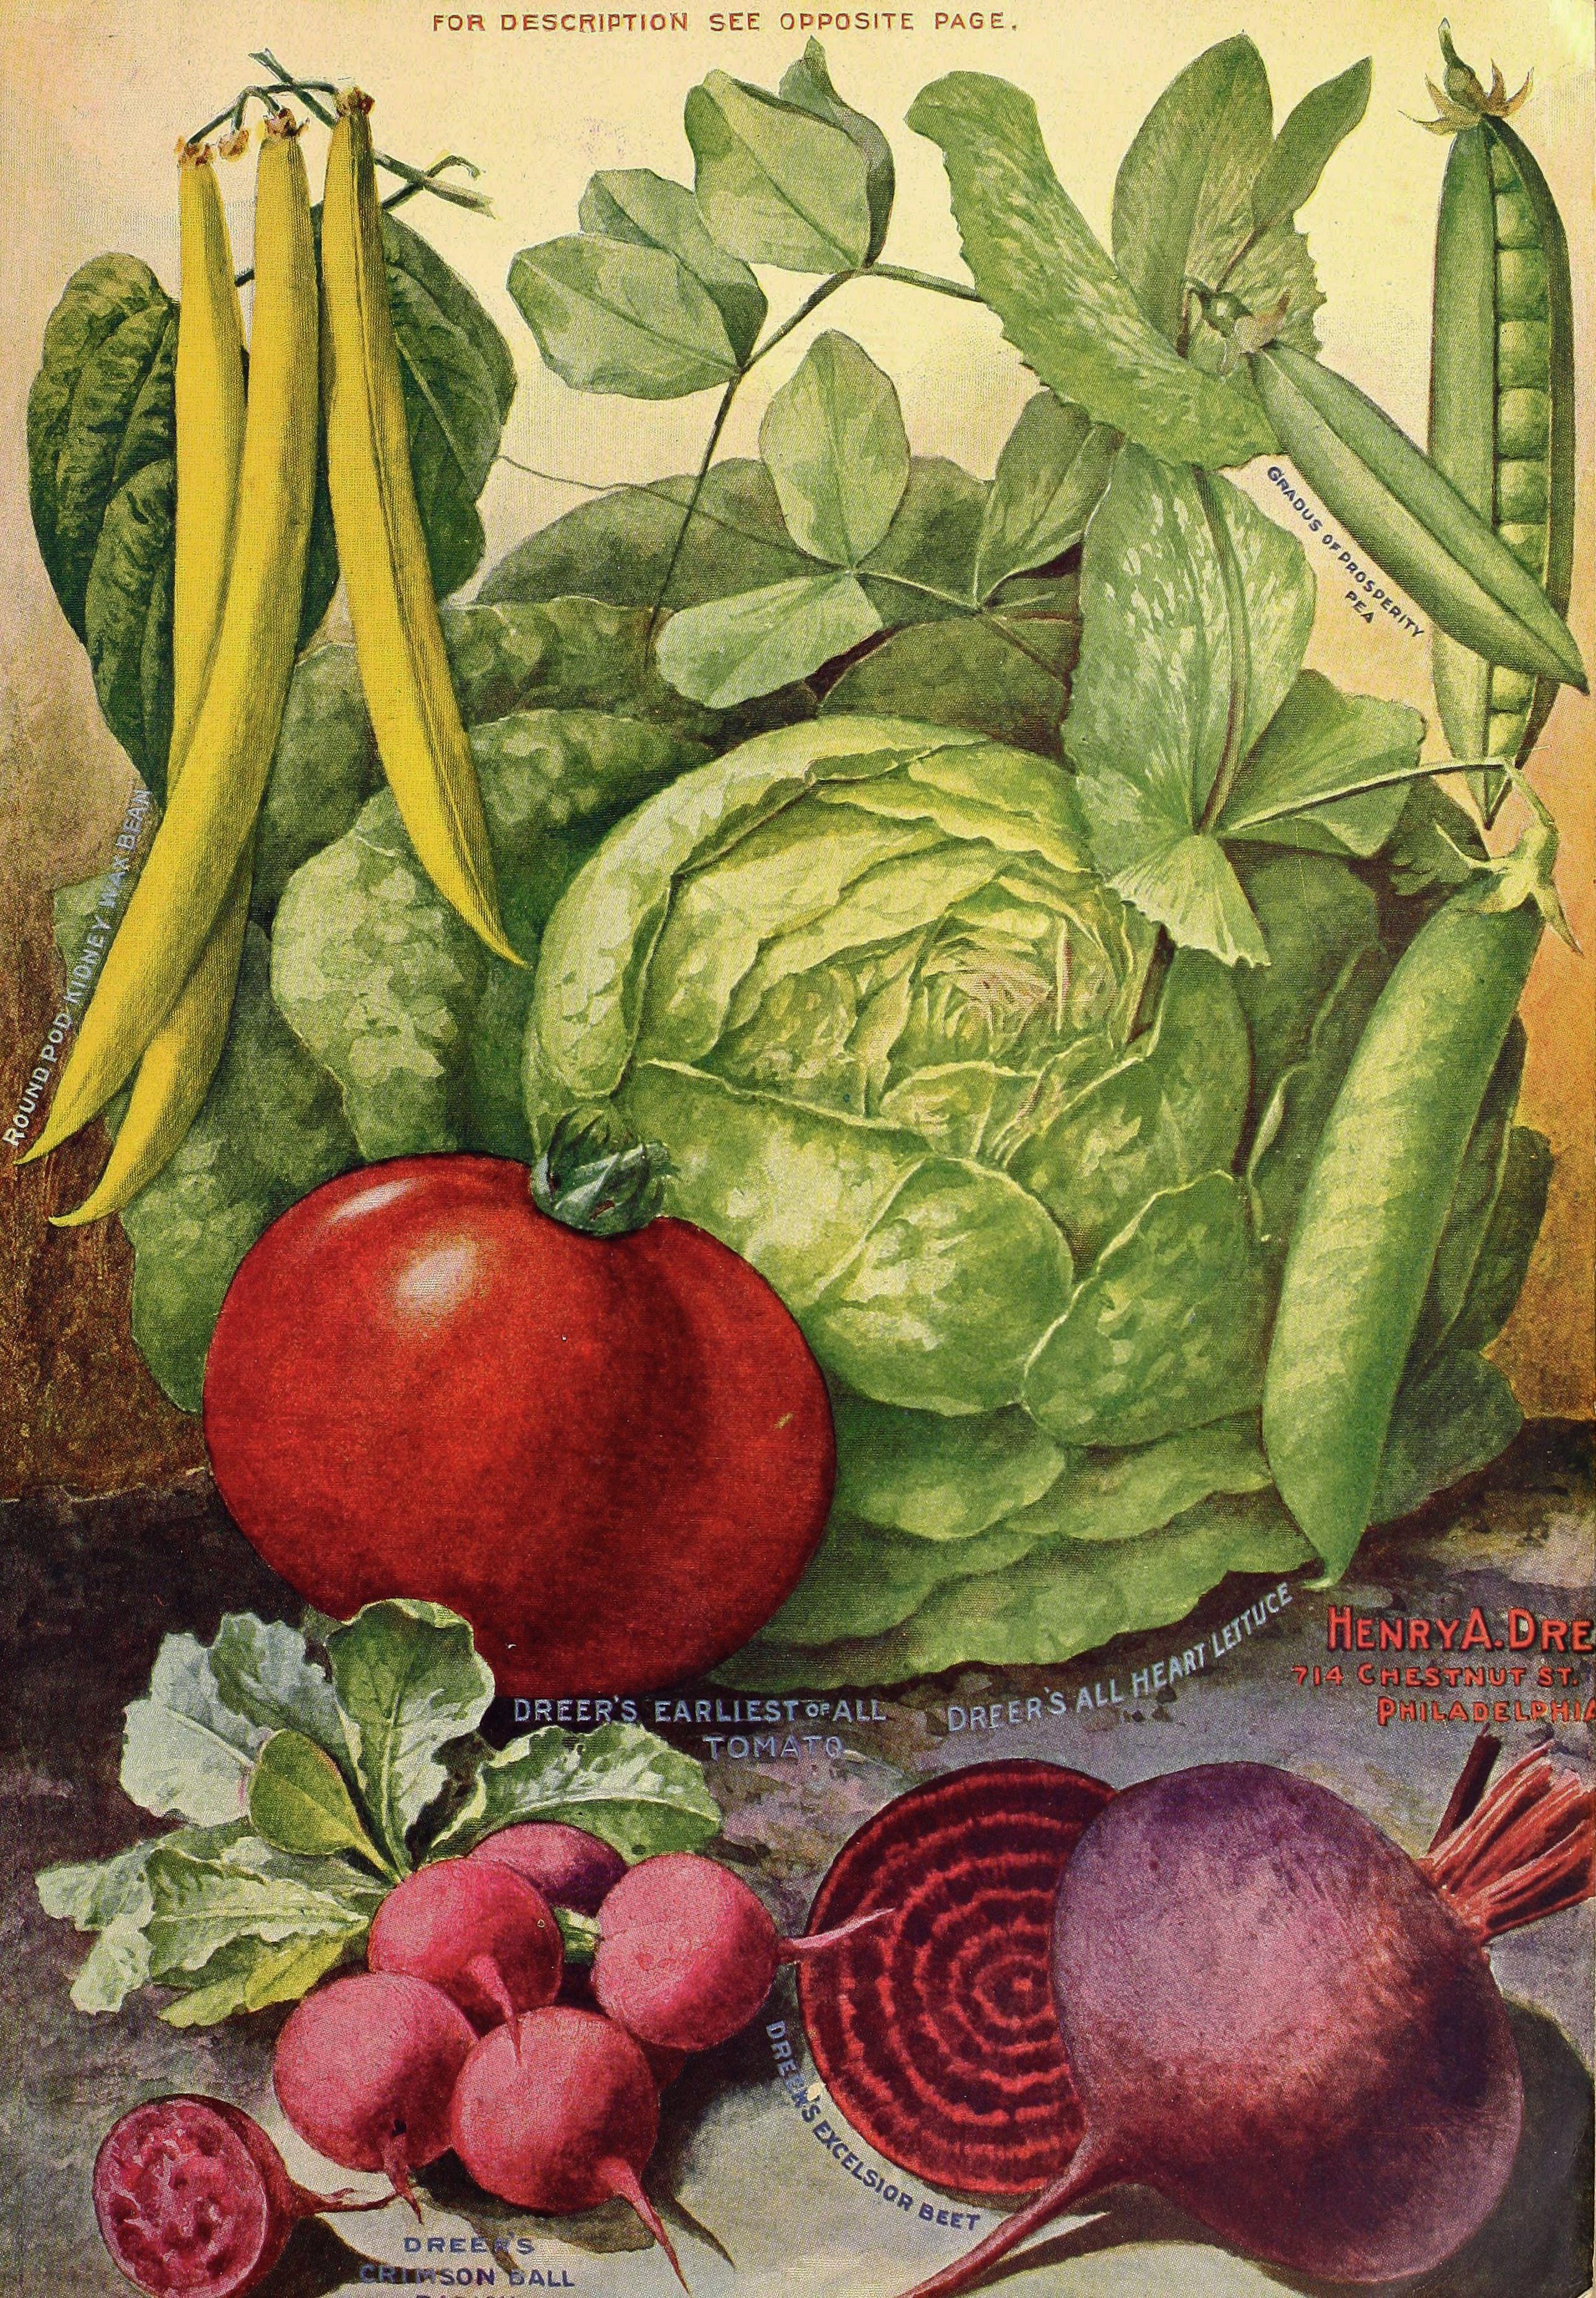 1902 Henry A. Dreer Vegetable Seed Catalog illustration ...